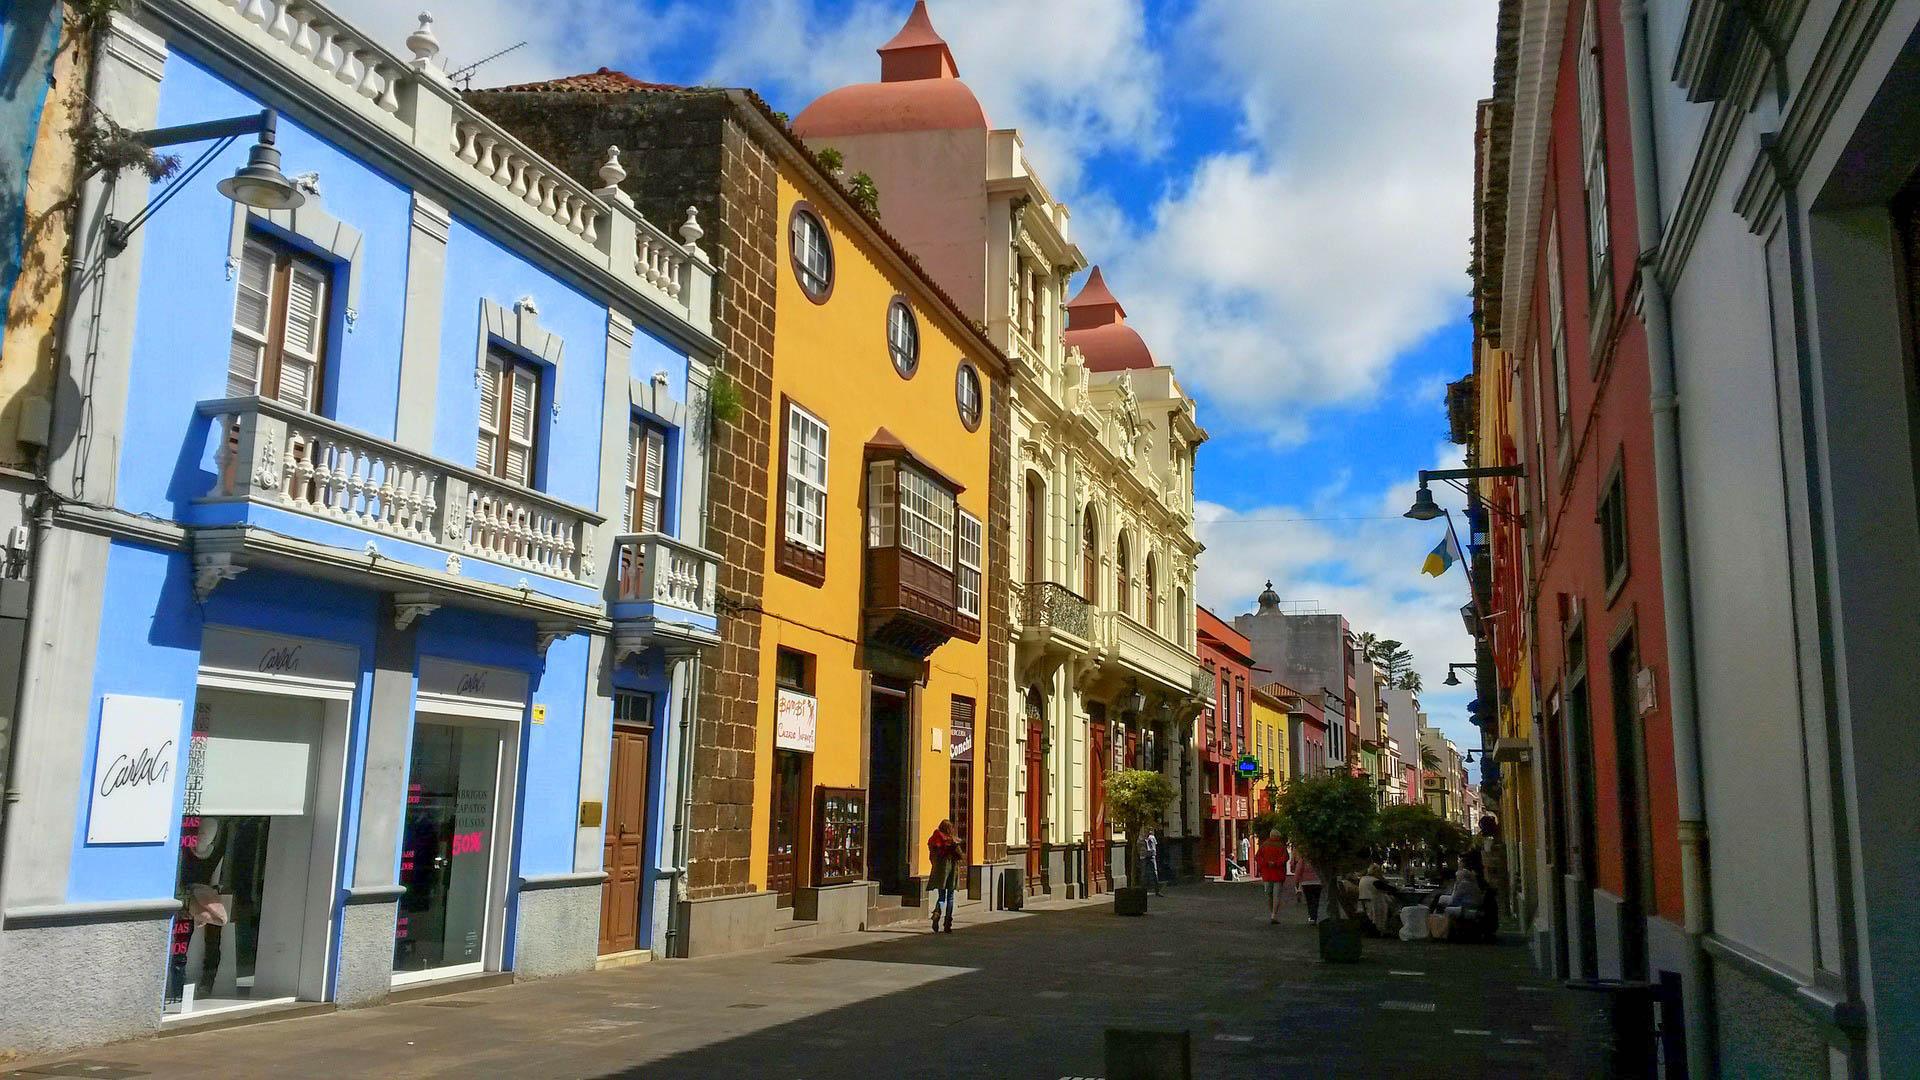 Іспанія Тенеріфе Сан-Крістобаль-де-ла-Лагуна